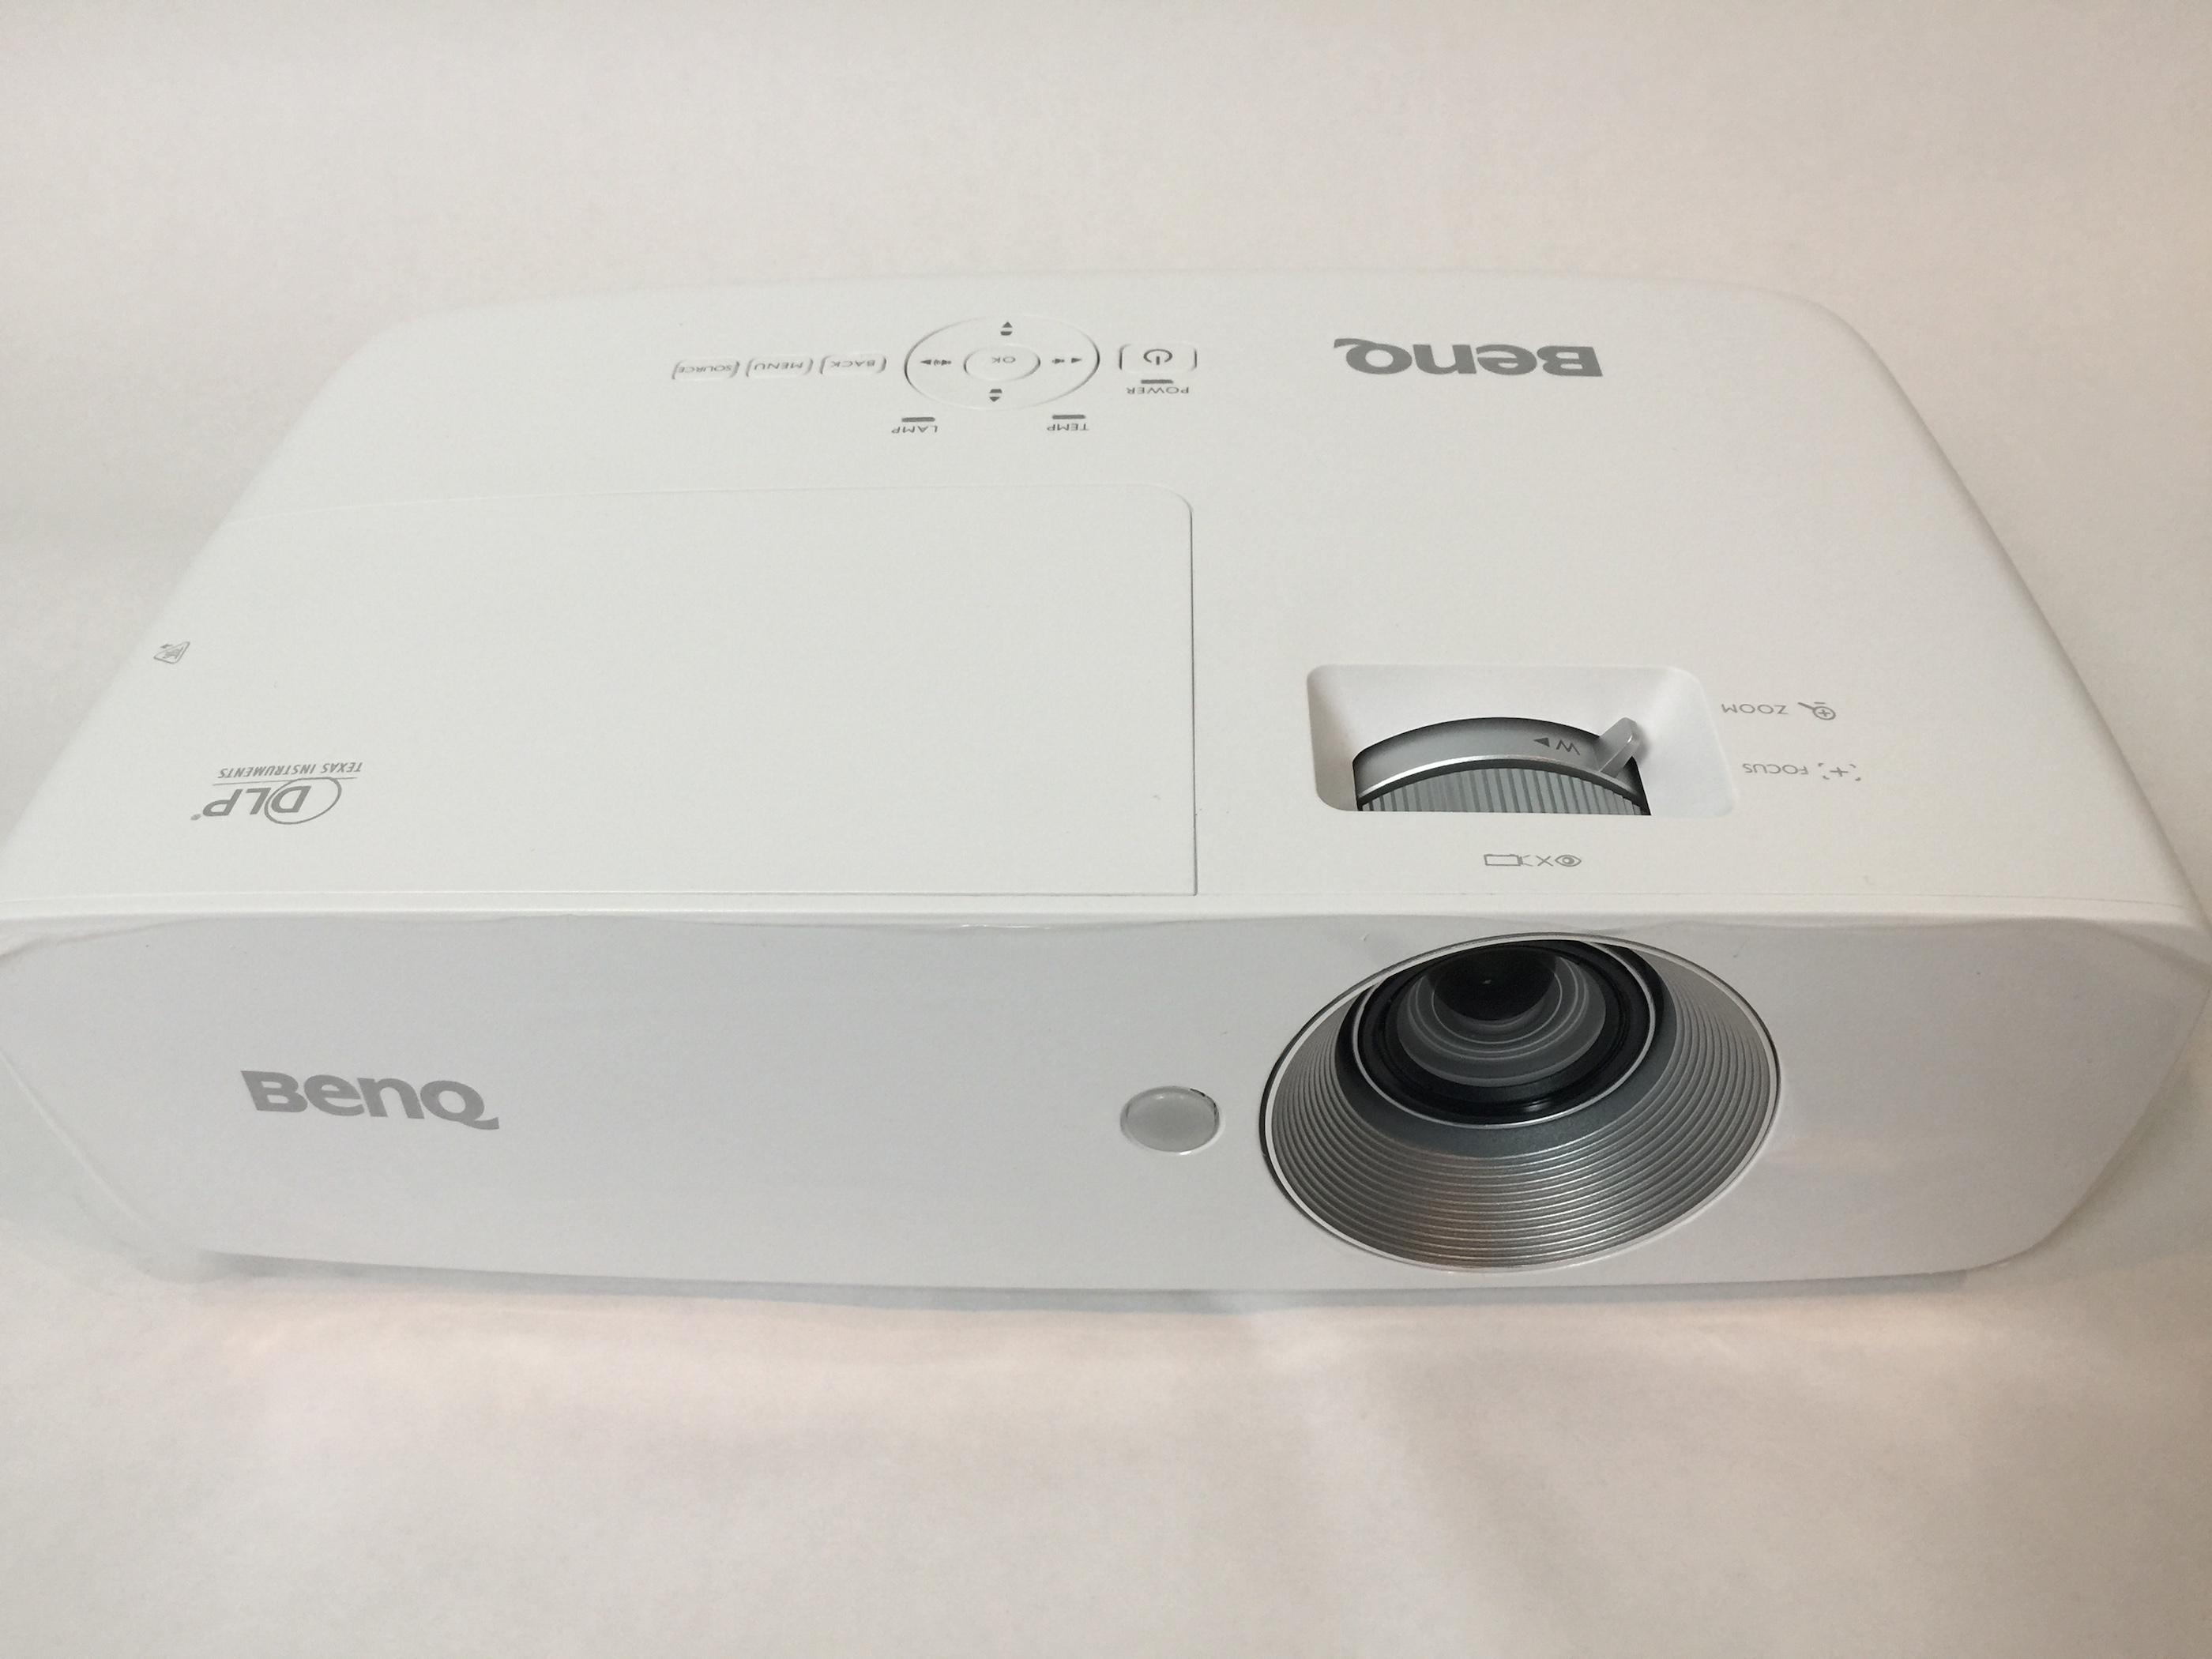 benq-home-theatre-w1090-projector-1